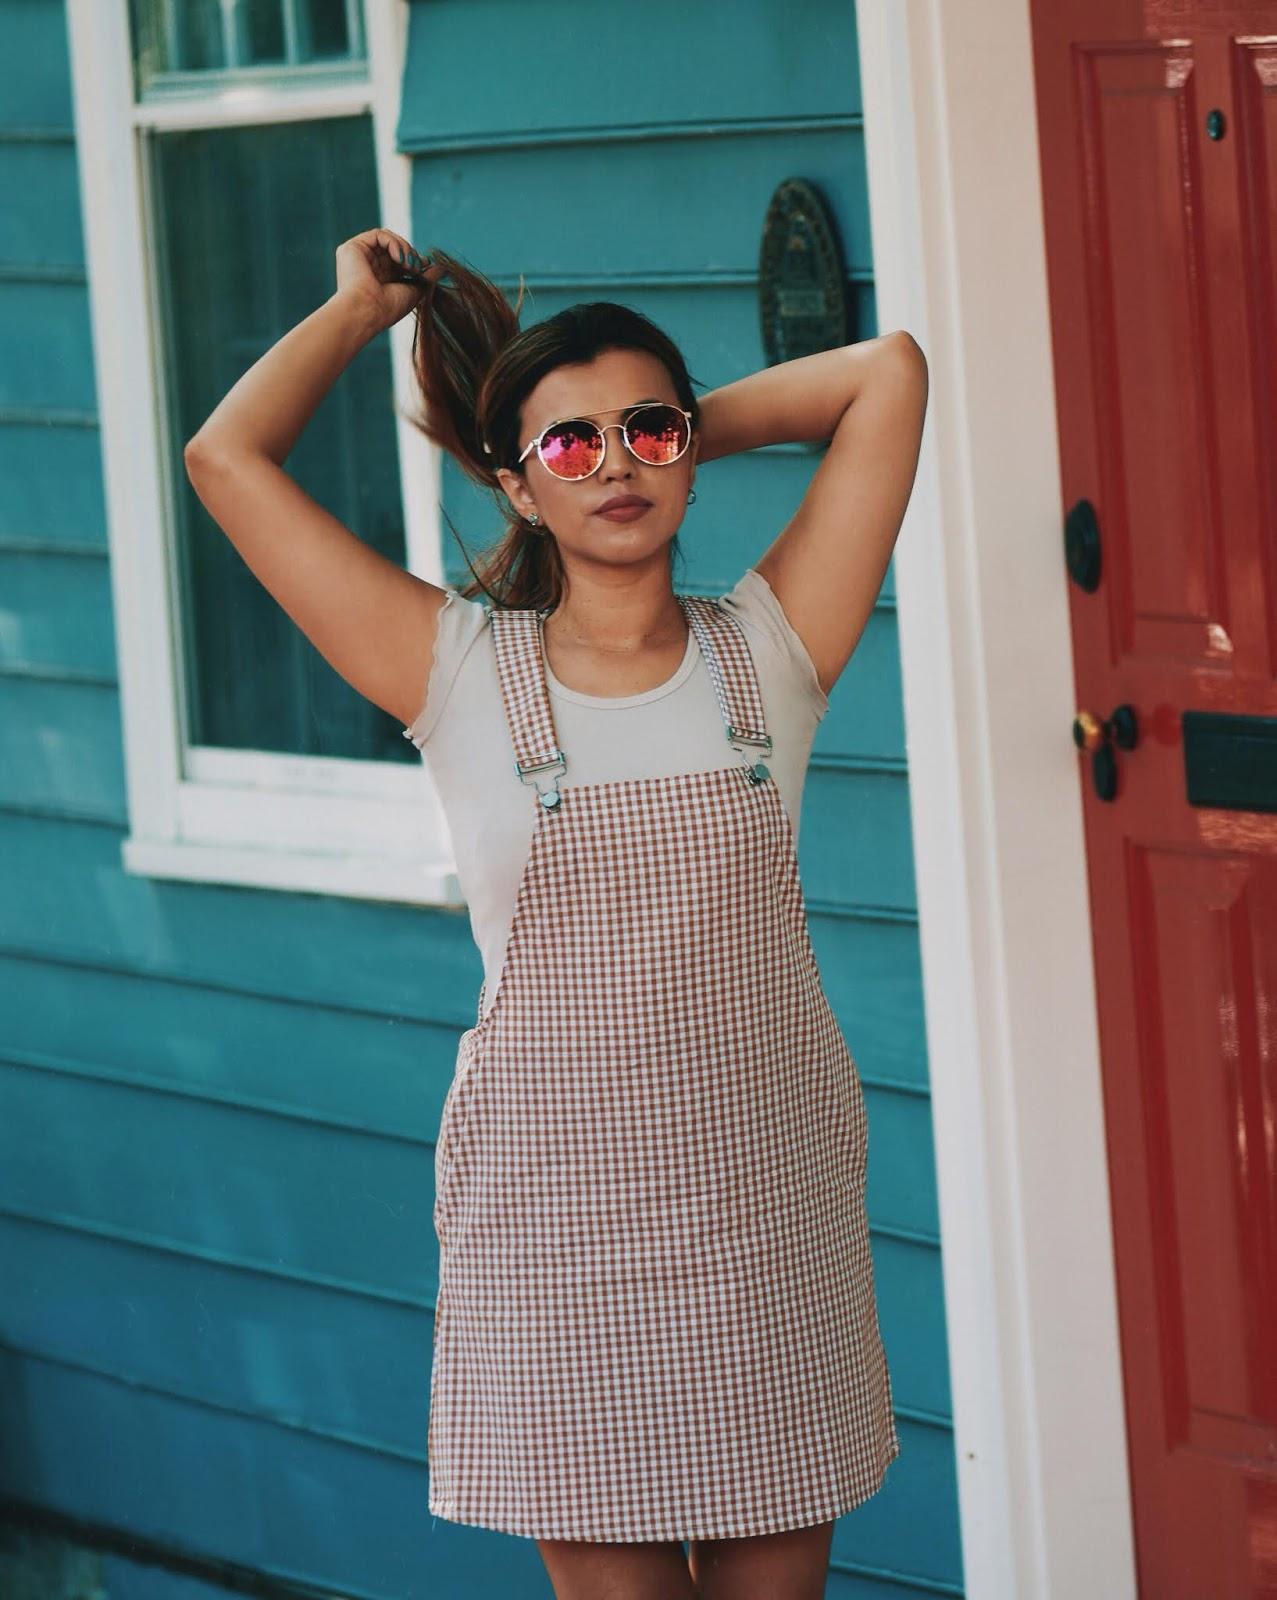 Gingham Overall- Mari Estilo-lookoftheday-shein-fashionblogger-vichy-estampados de moda-fashionista-blogger